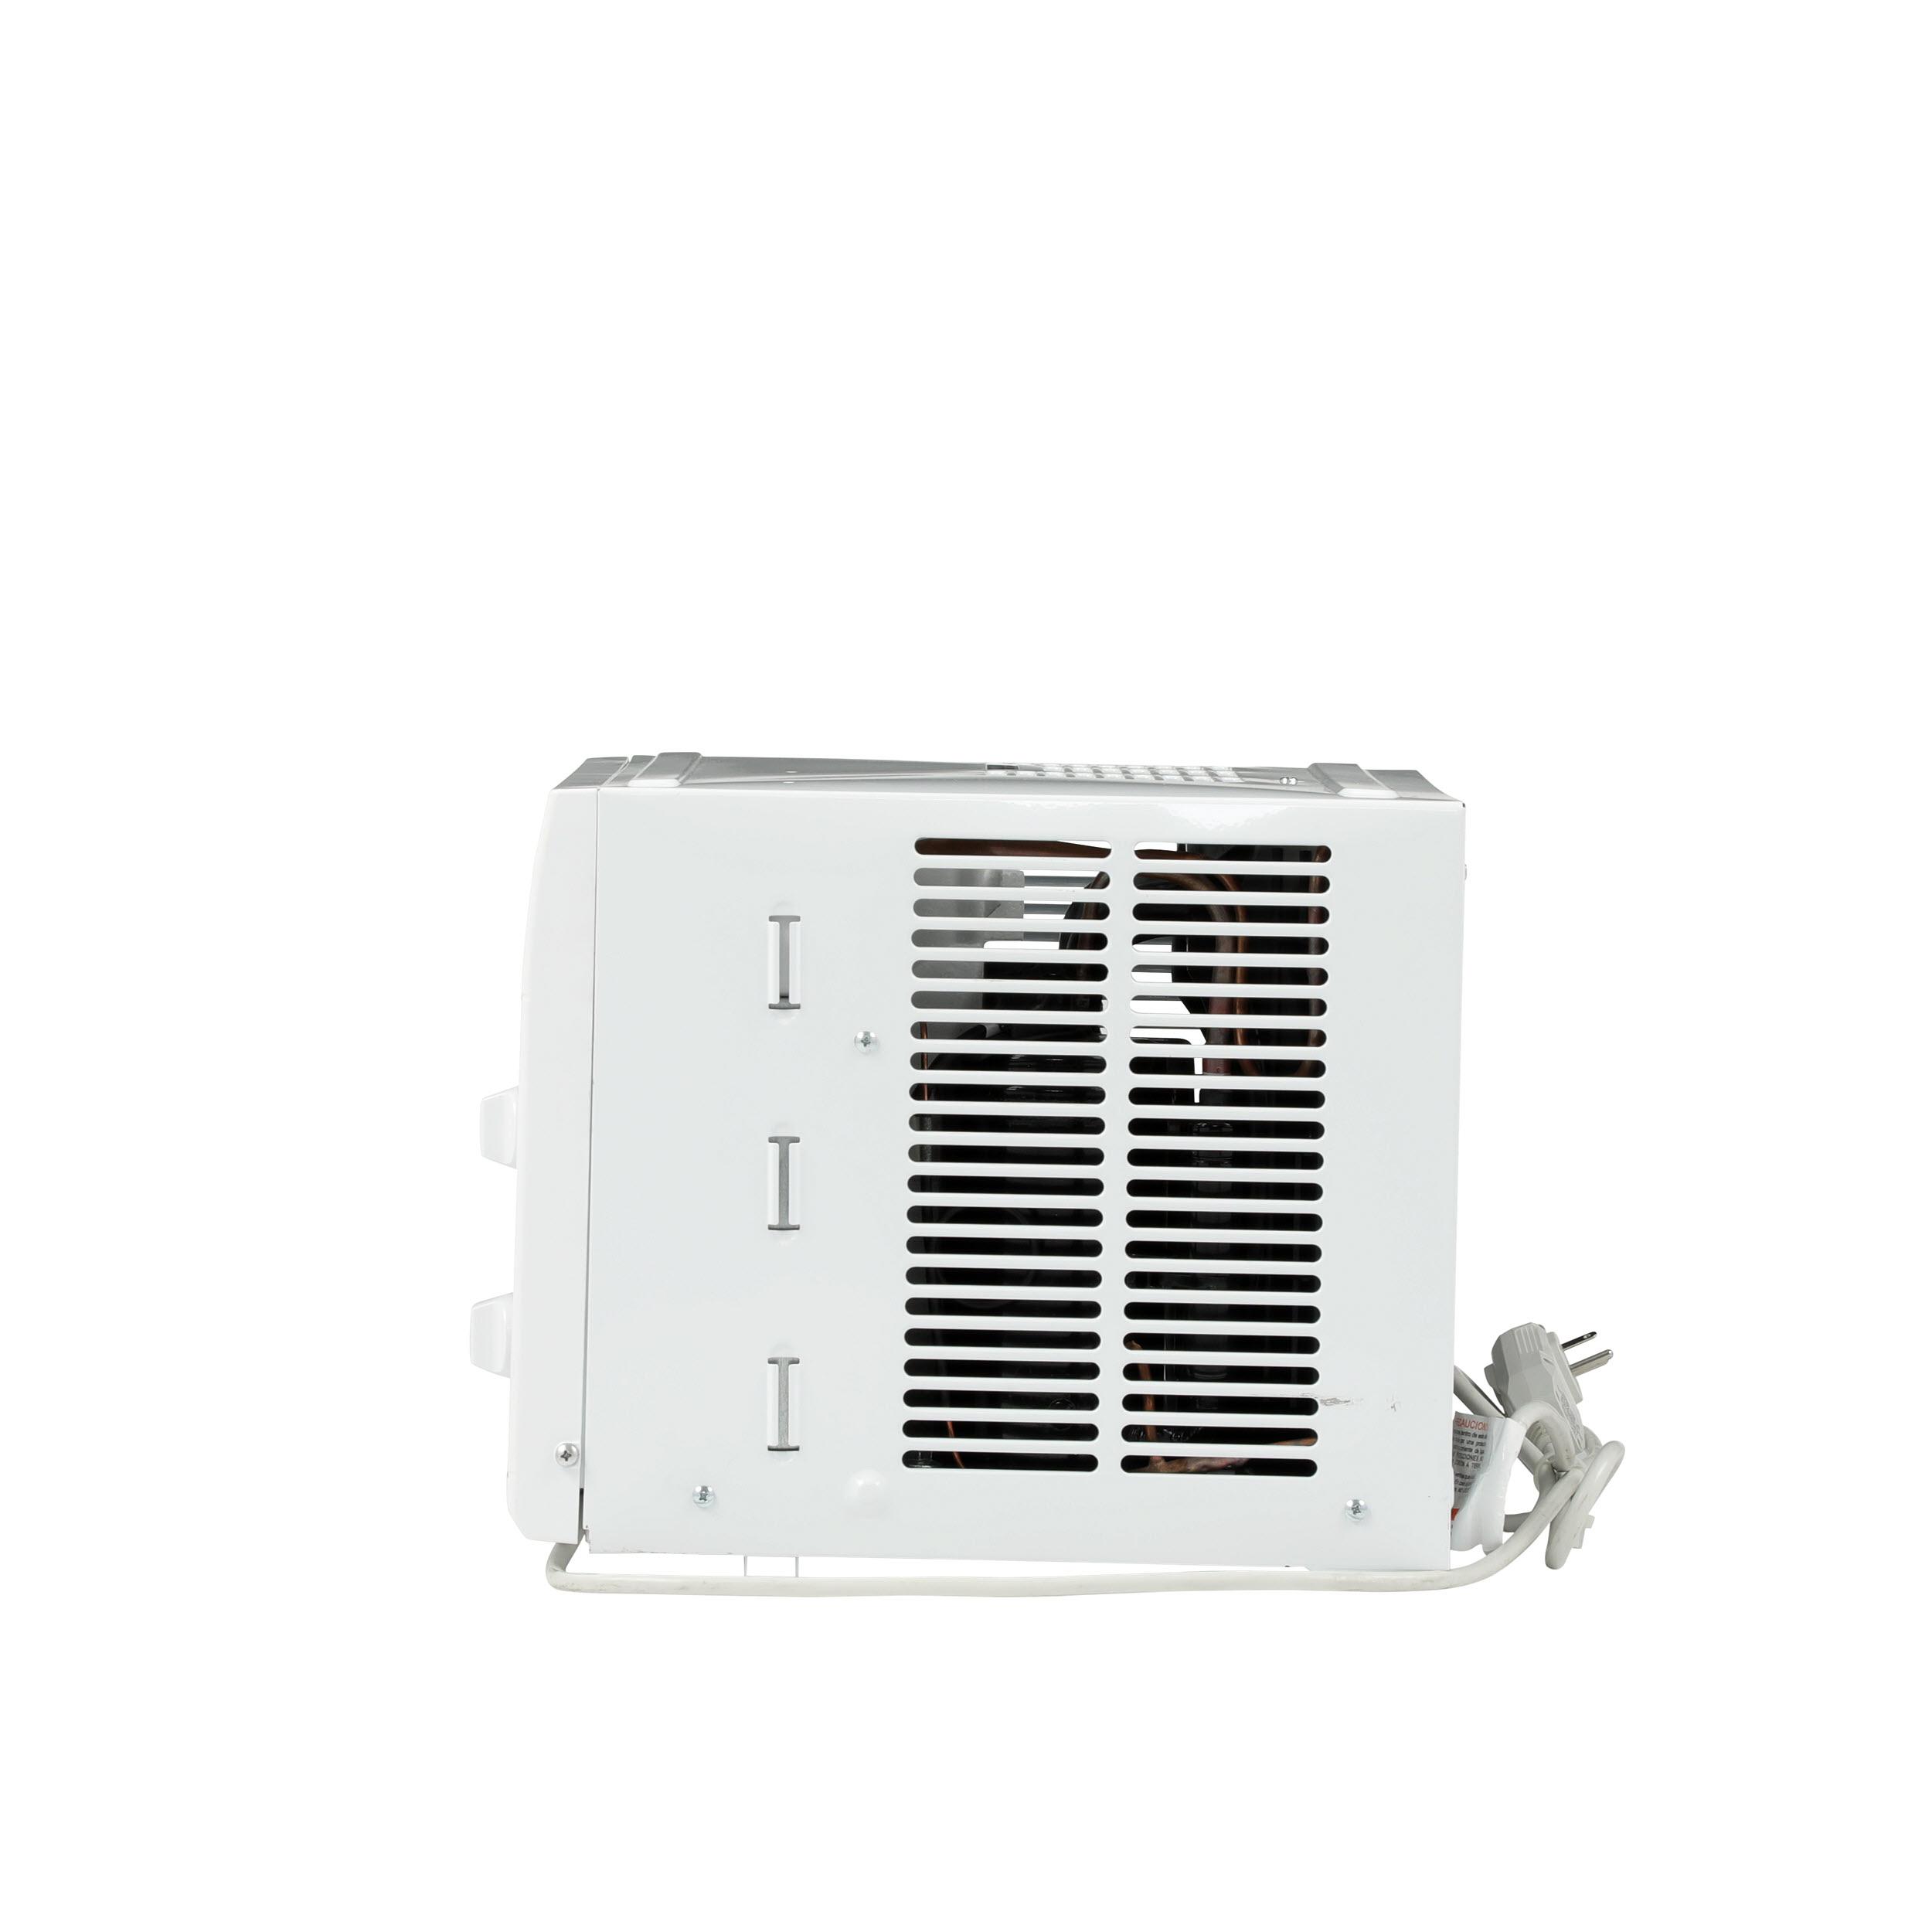 Model: AHV05LZ | GE GE® 115 Volt Smart Room Air Conditioner